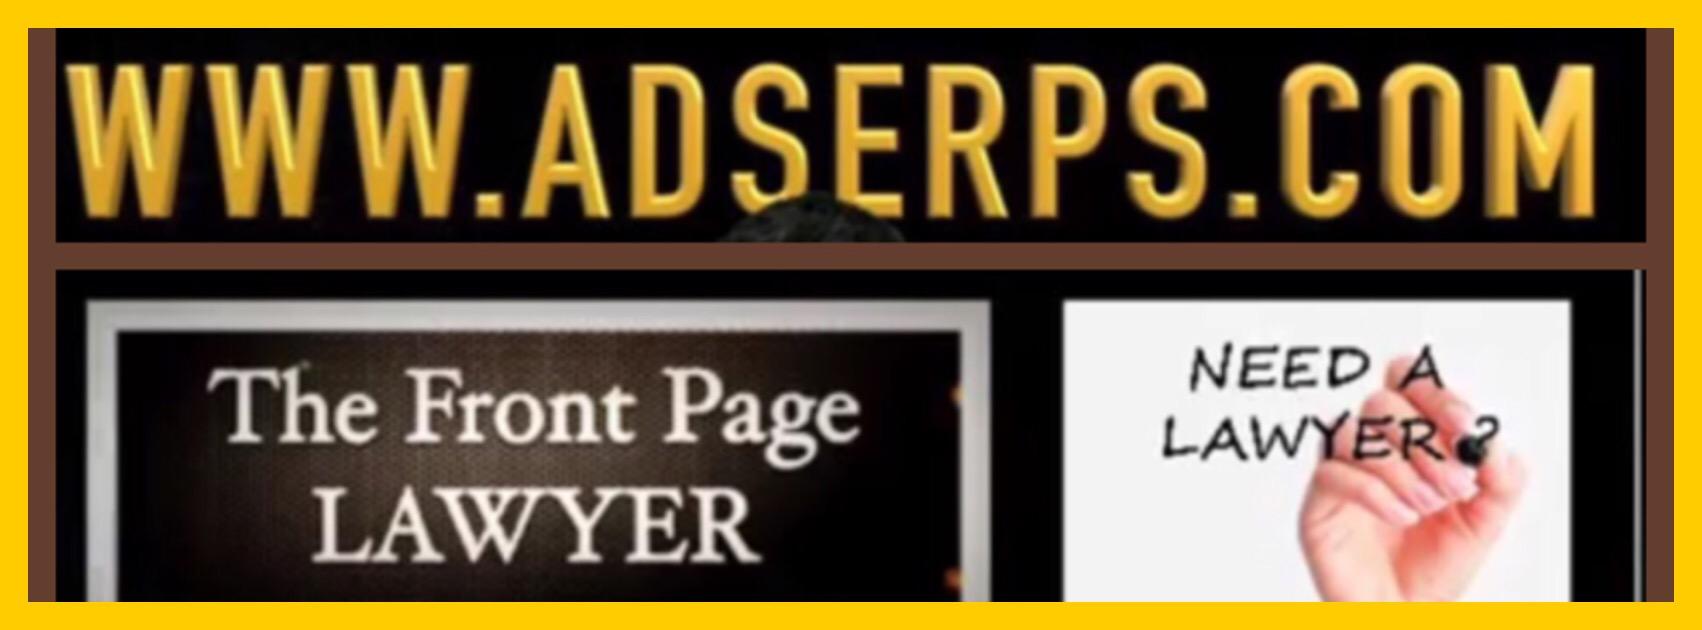 http://www.bestlawyerslocal.com best marketing internet adverrising for law attorneys